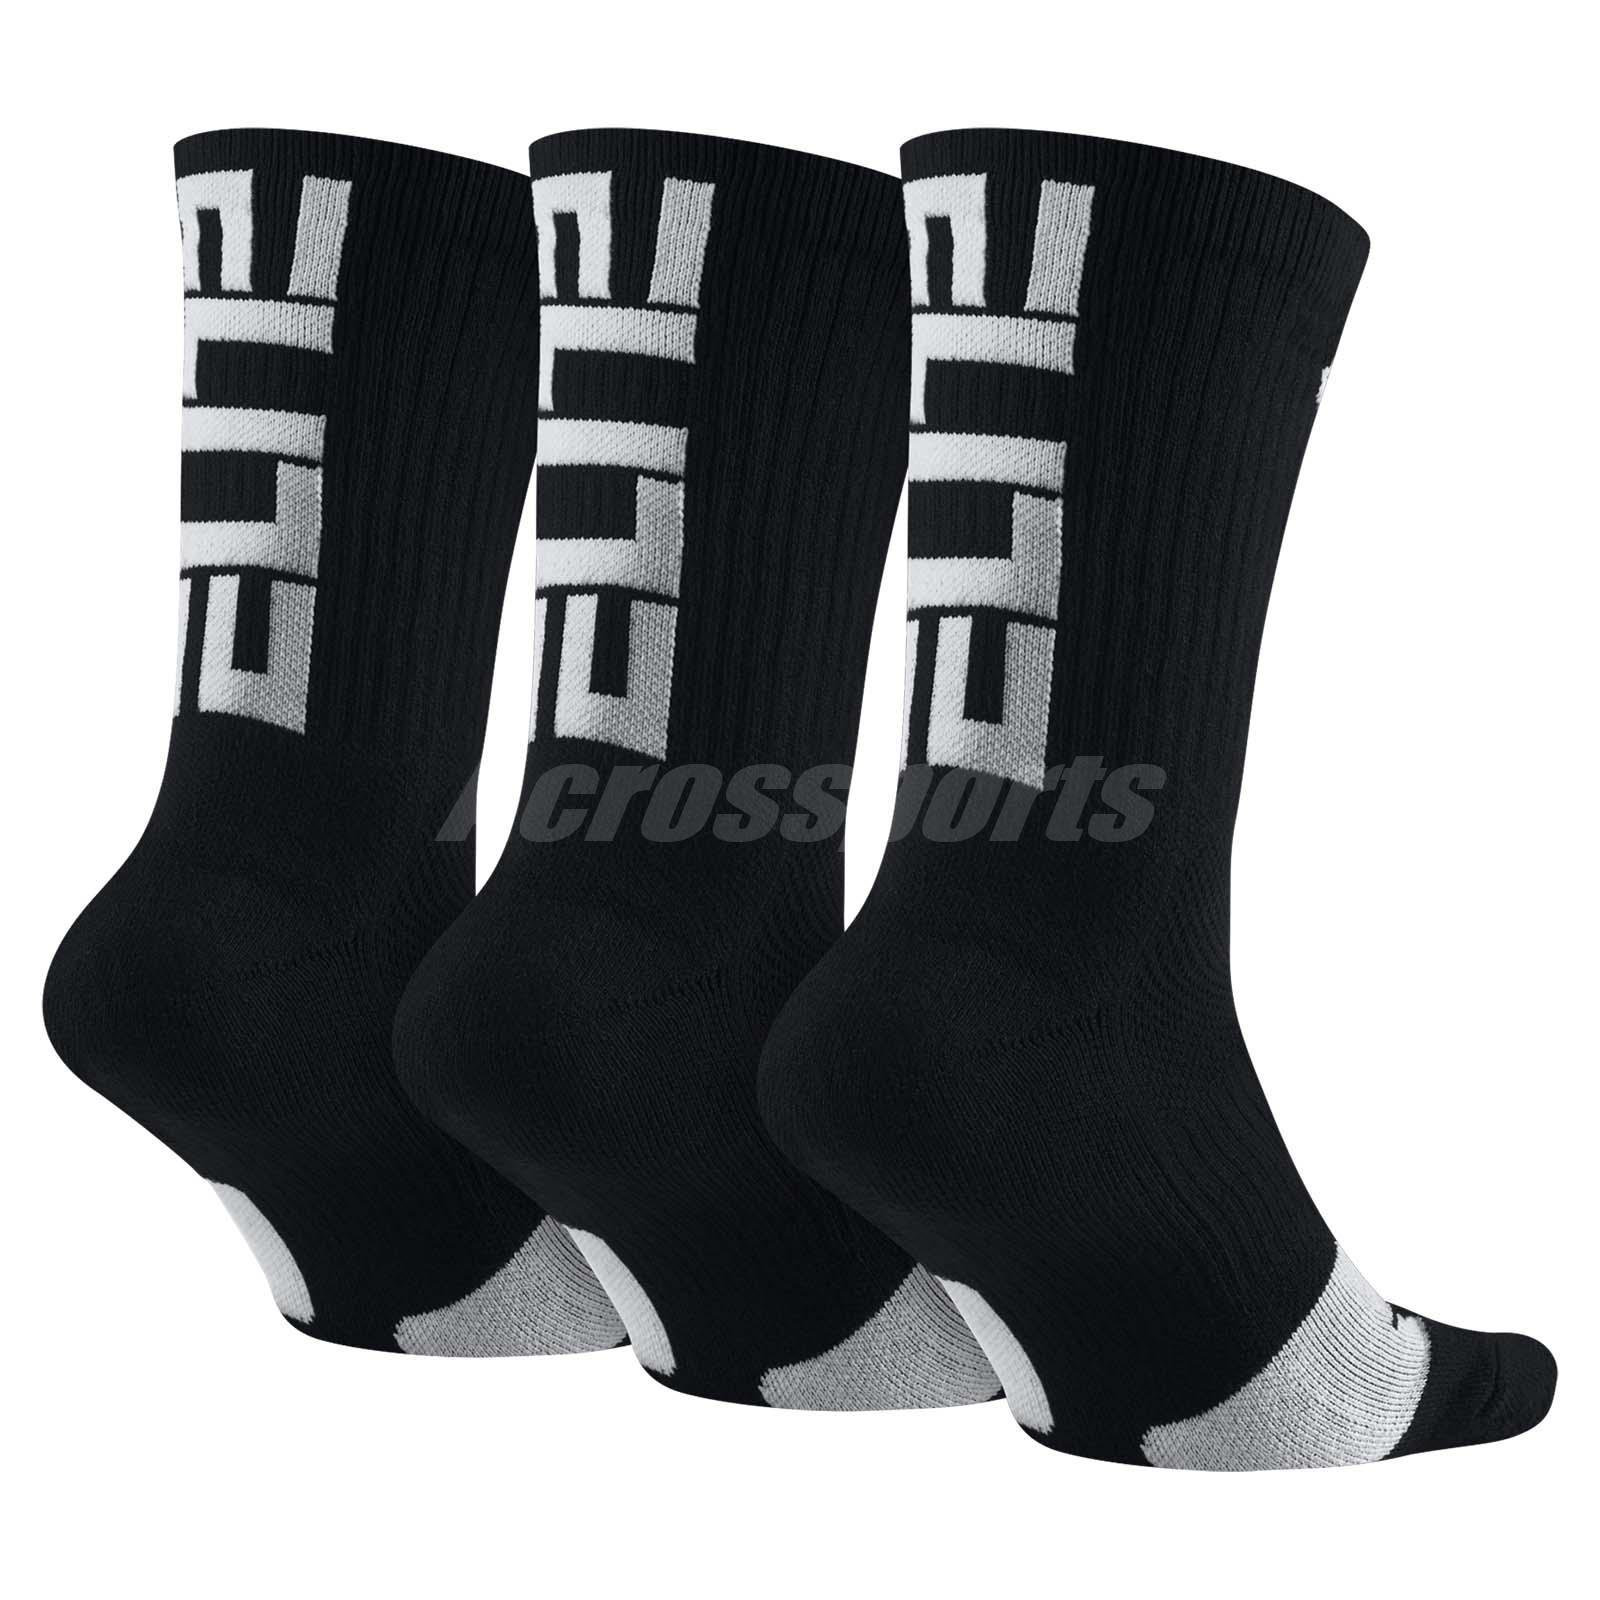 Nike Elite Crew Basketball Socks 3 Pairs 1 Pack Hoops Training Black SX7627-010